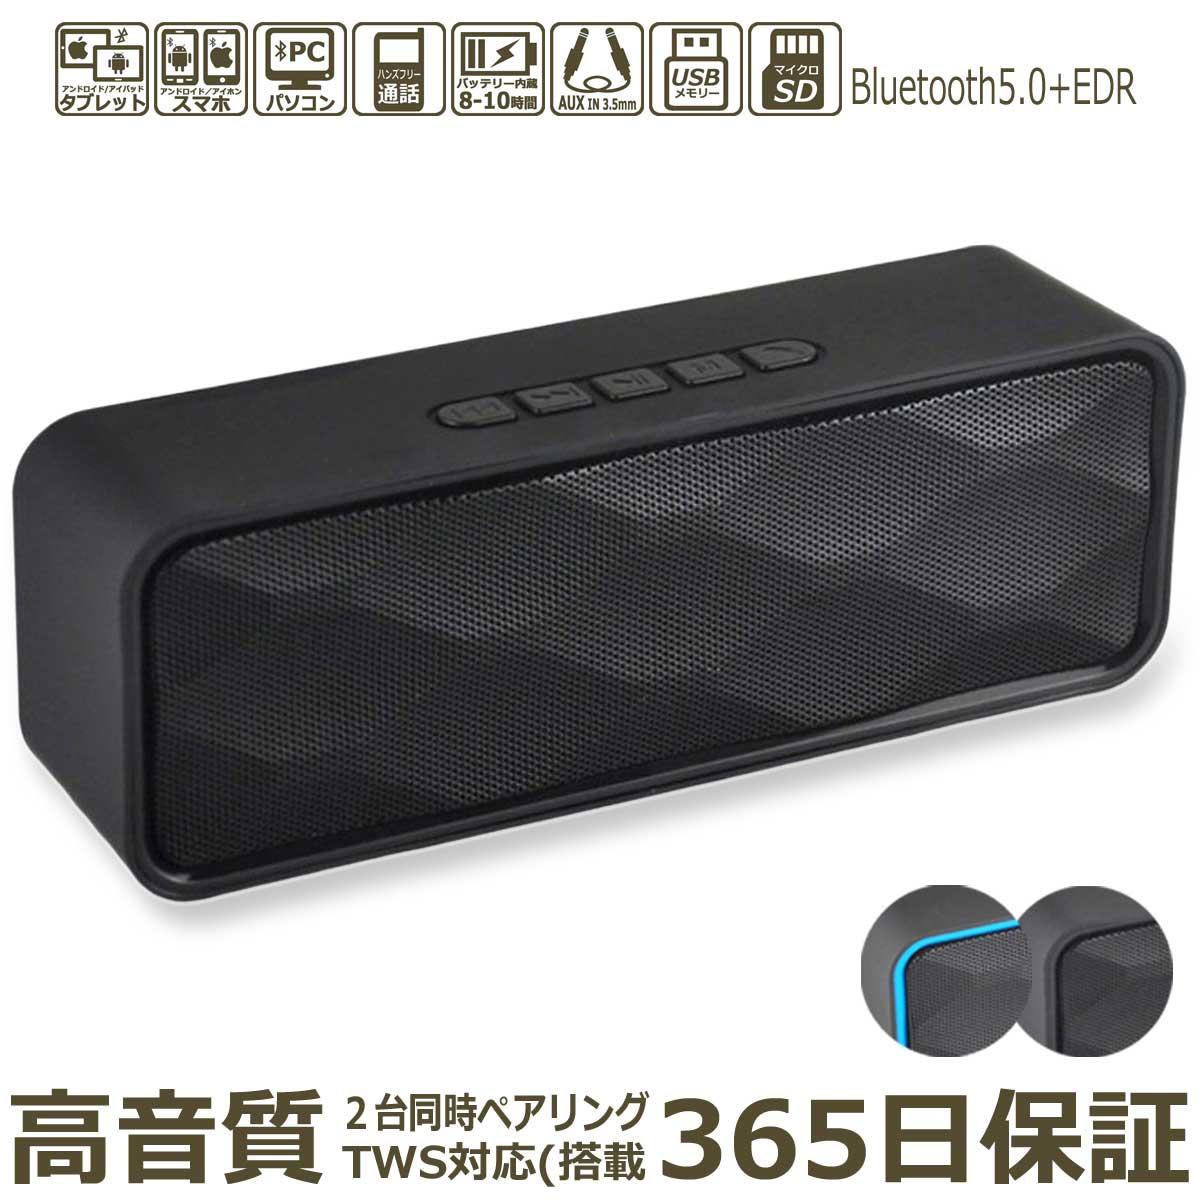 AGM ブルートゥース スピーカー Bluetooth 高音質 高出力 重低音 電話 アウトドア 野外 旅行 屋外 iphone ipad ipod mini pc スマホ コスパ ブラック SC211